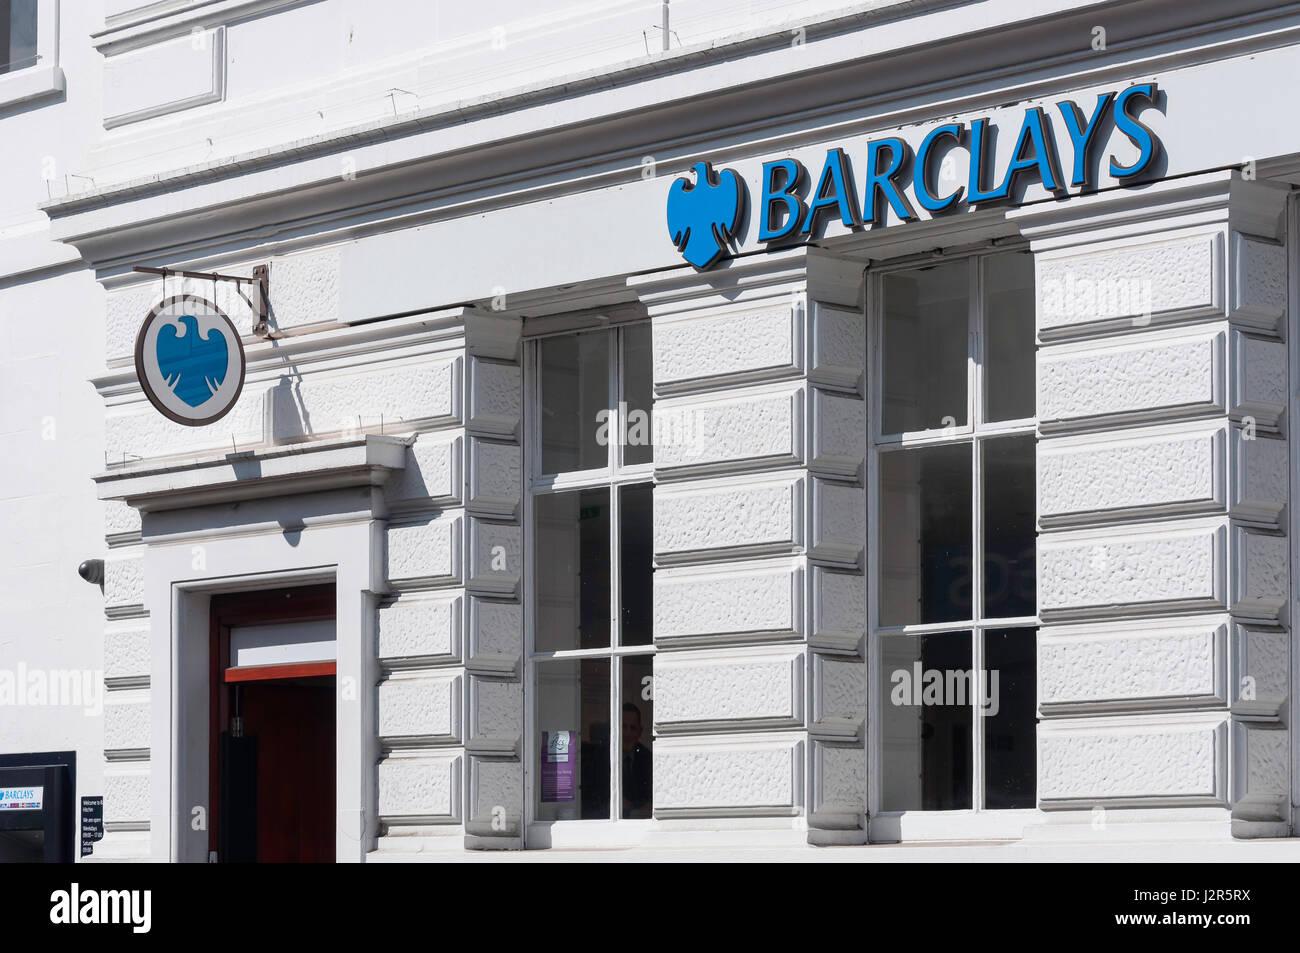 Barclays Bank, High Street, Hitchin, Hertfordshire, England, United Kingdom - Stock Image